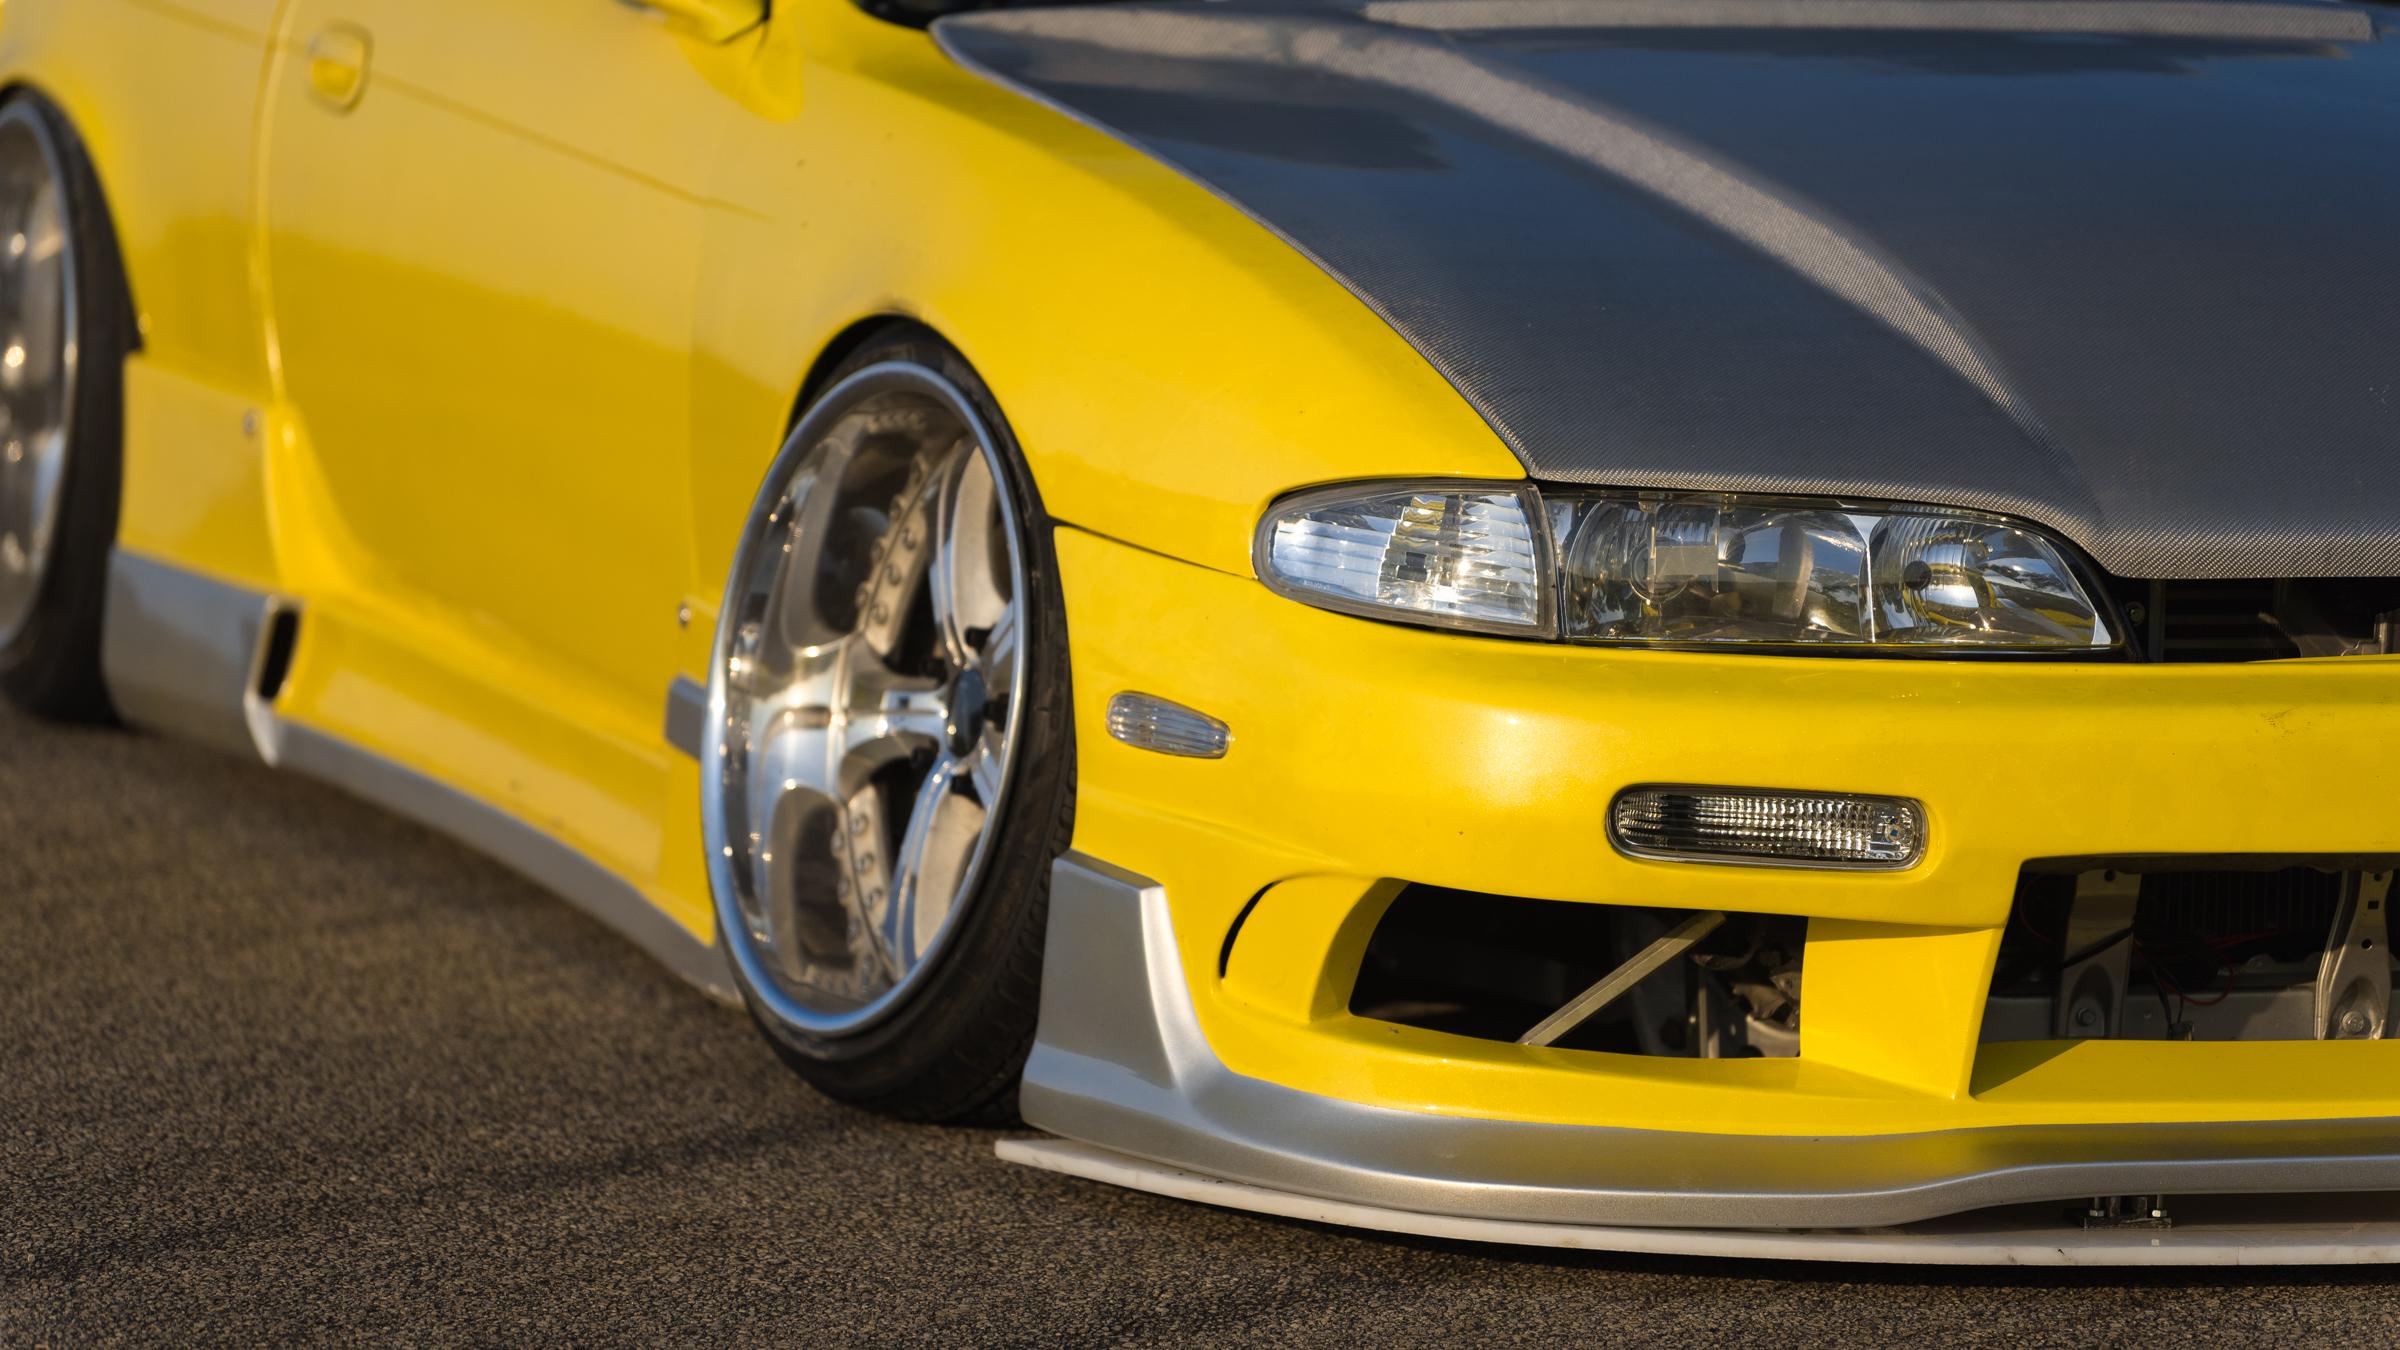 New Mazda Rx7 >> Nissan Silvia (S14 Zenki) – Racing Line – ORIGIN